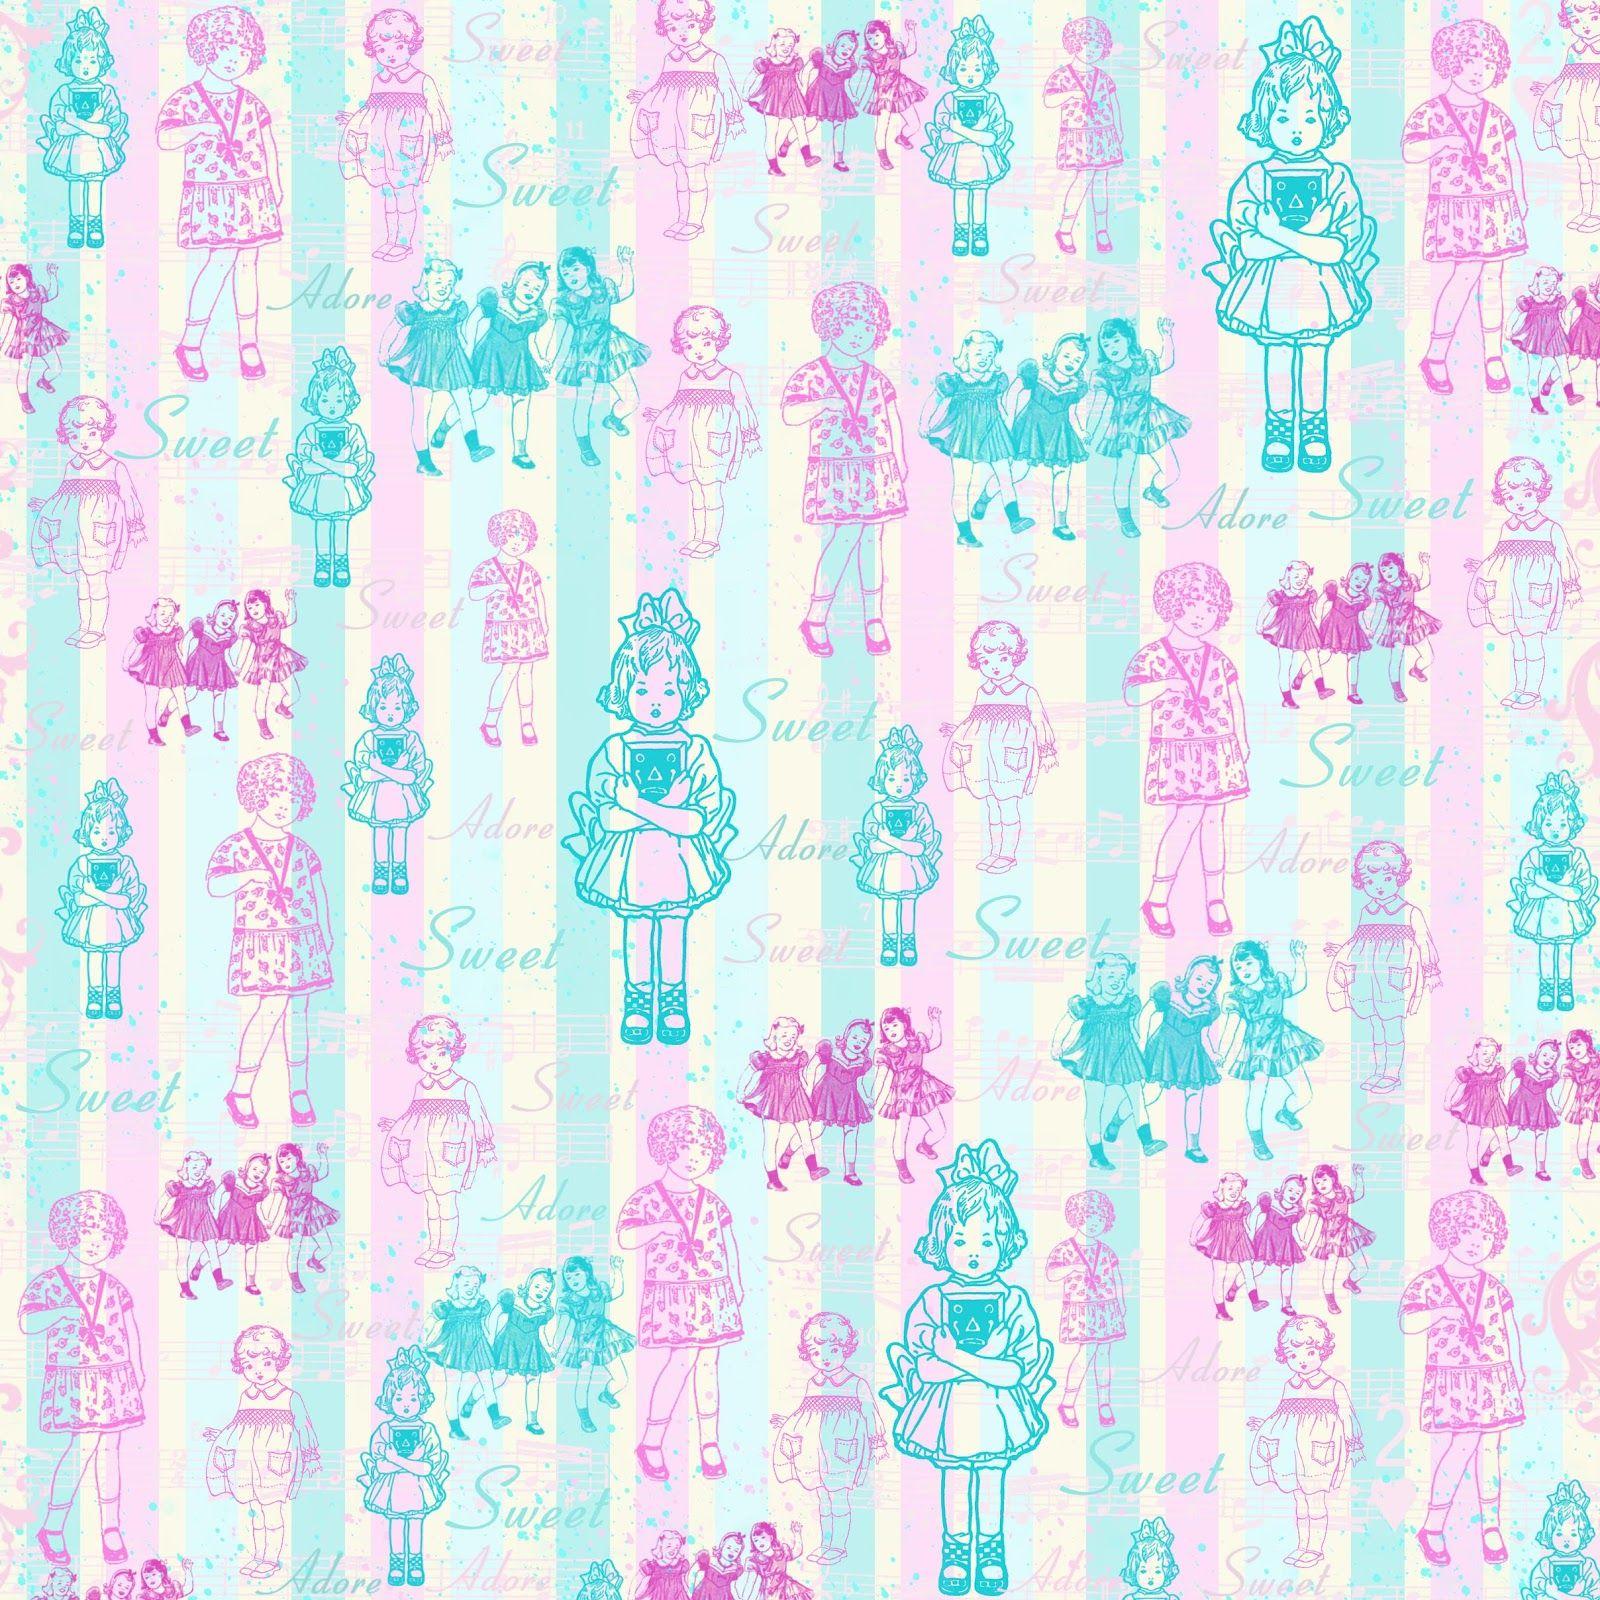 Scrapbook paper download - Free Digital Scrapbook Paper Blue And Pink Stripes